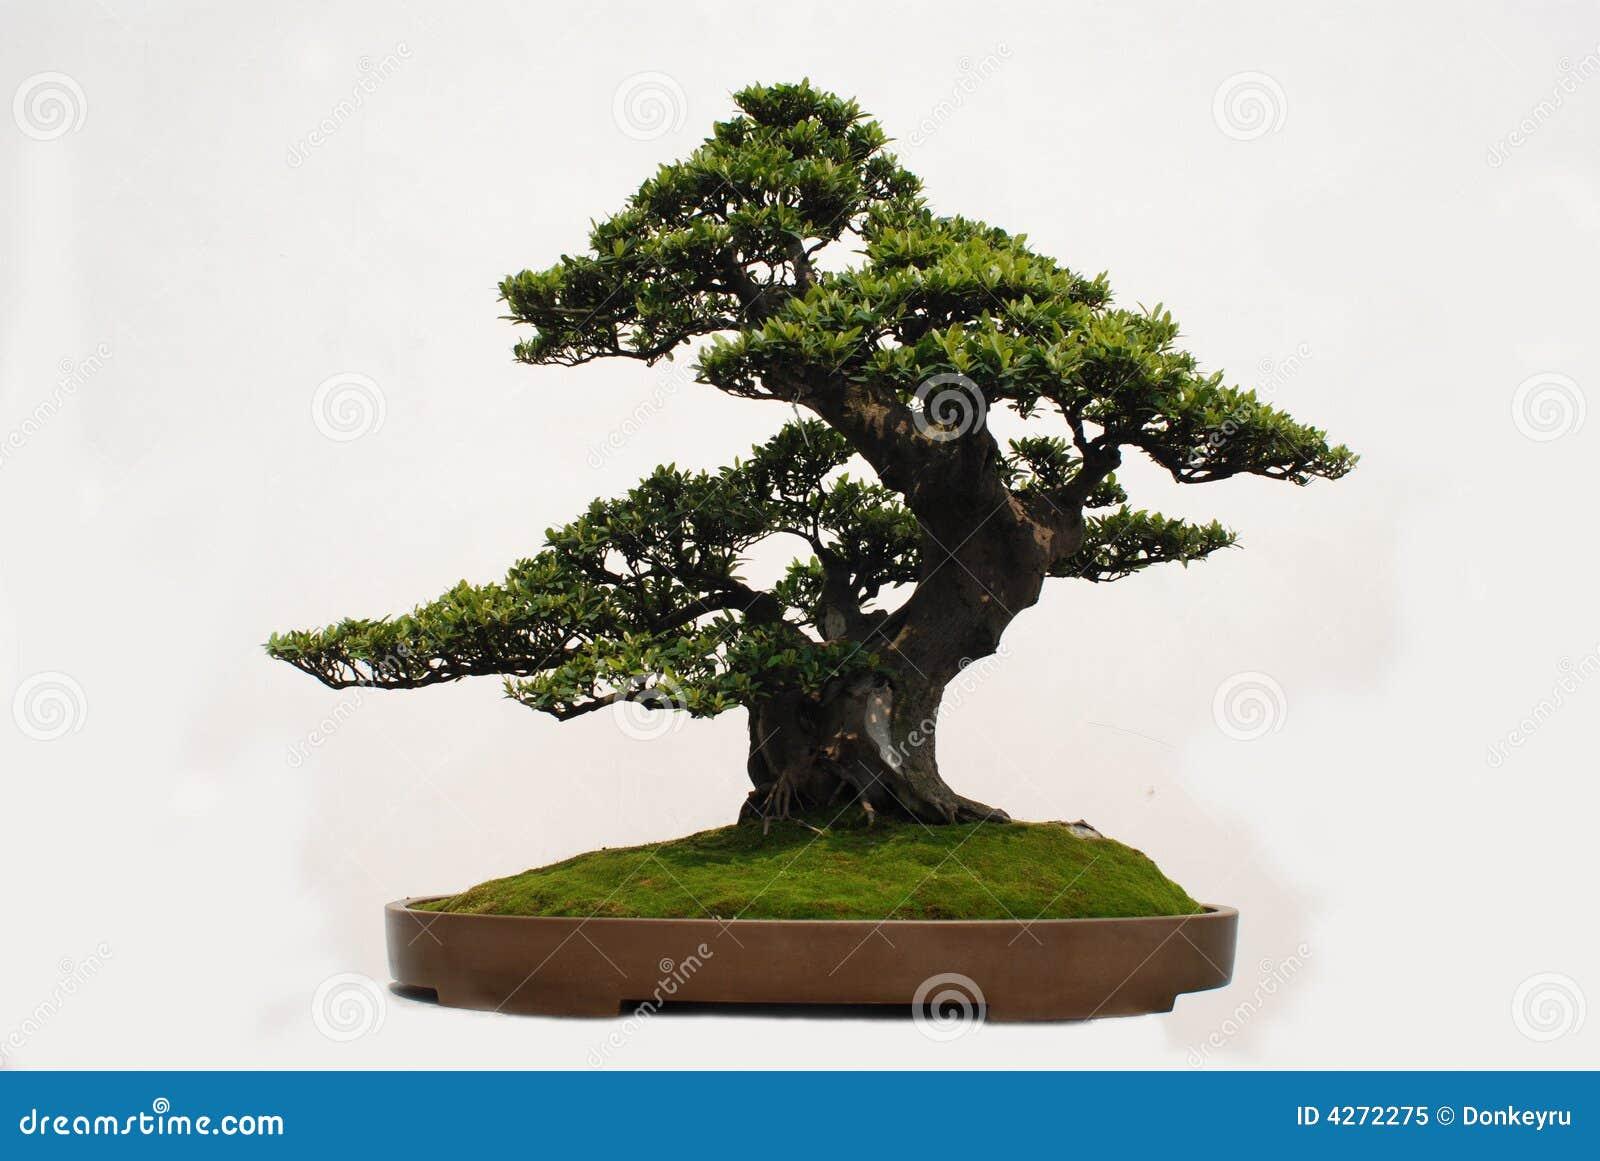 Bonsai of Yaccatree